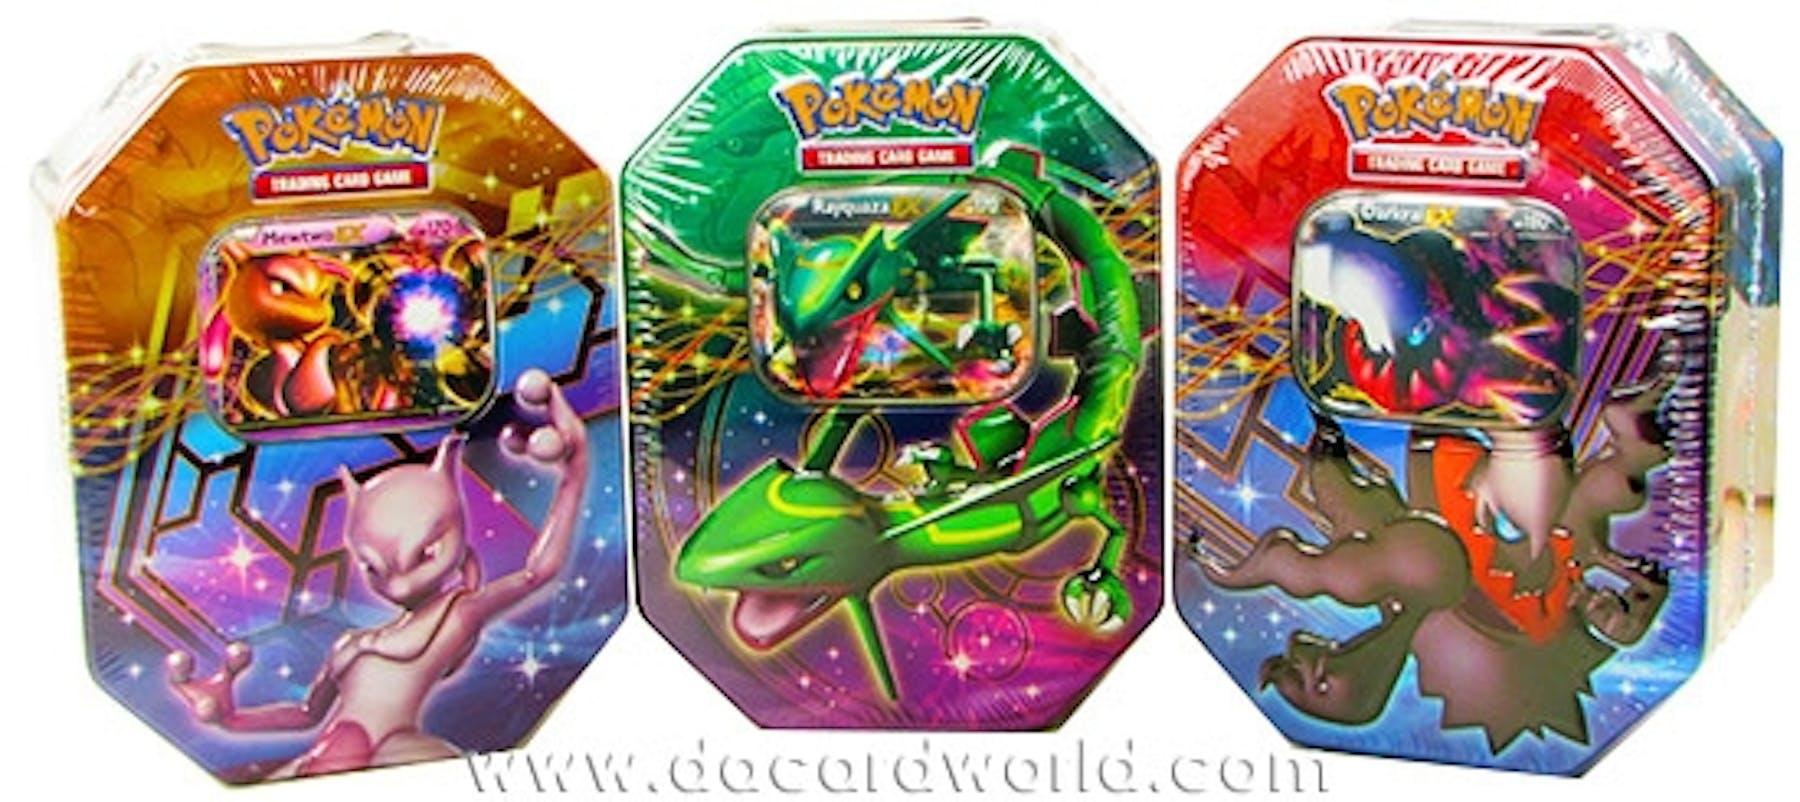 2012 Pokemon Legendary Collection Fall Ex Tin Set Of 3